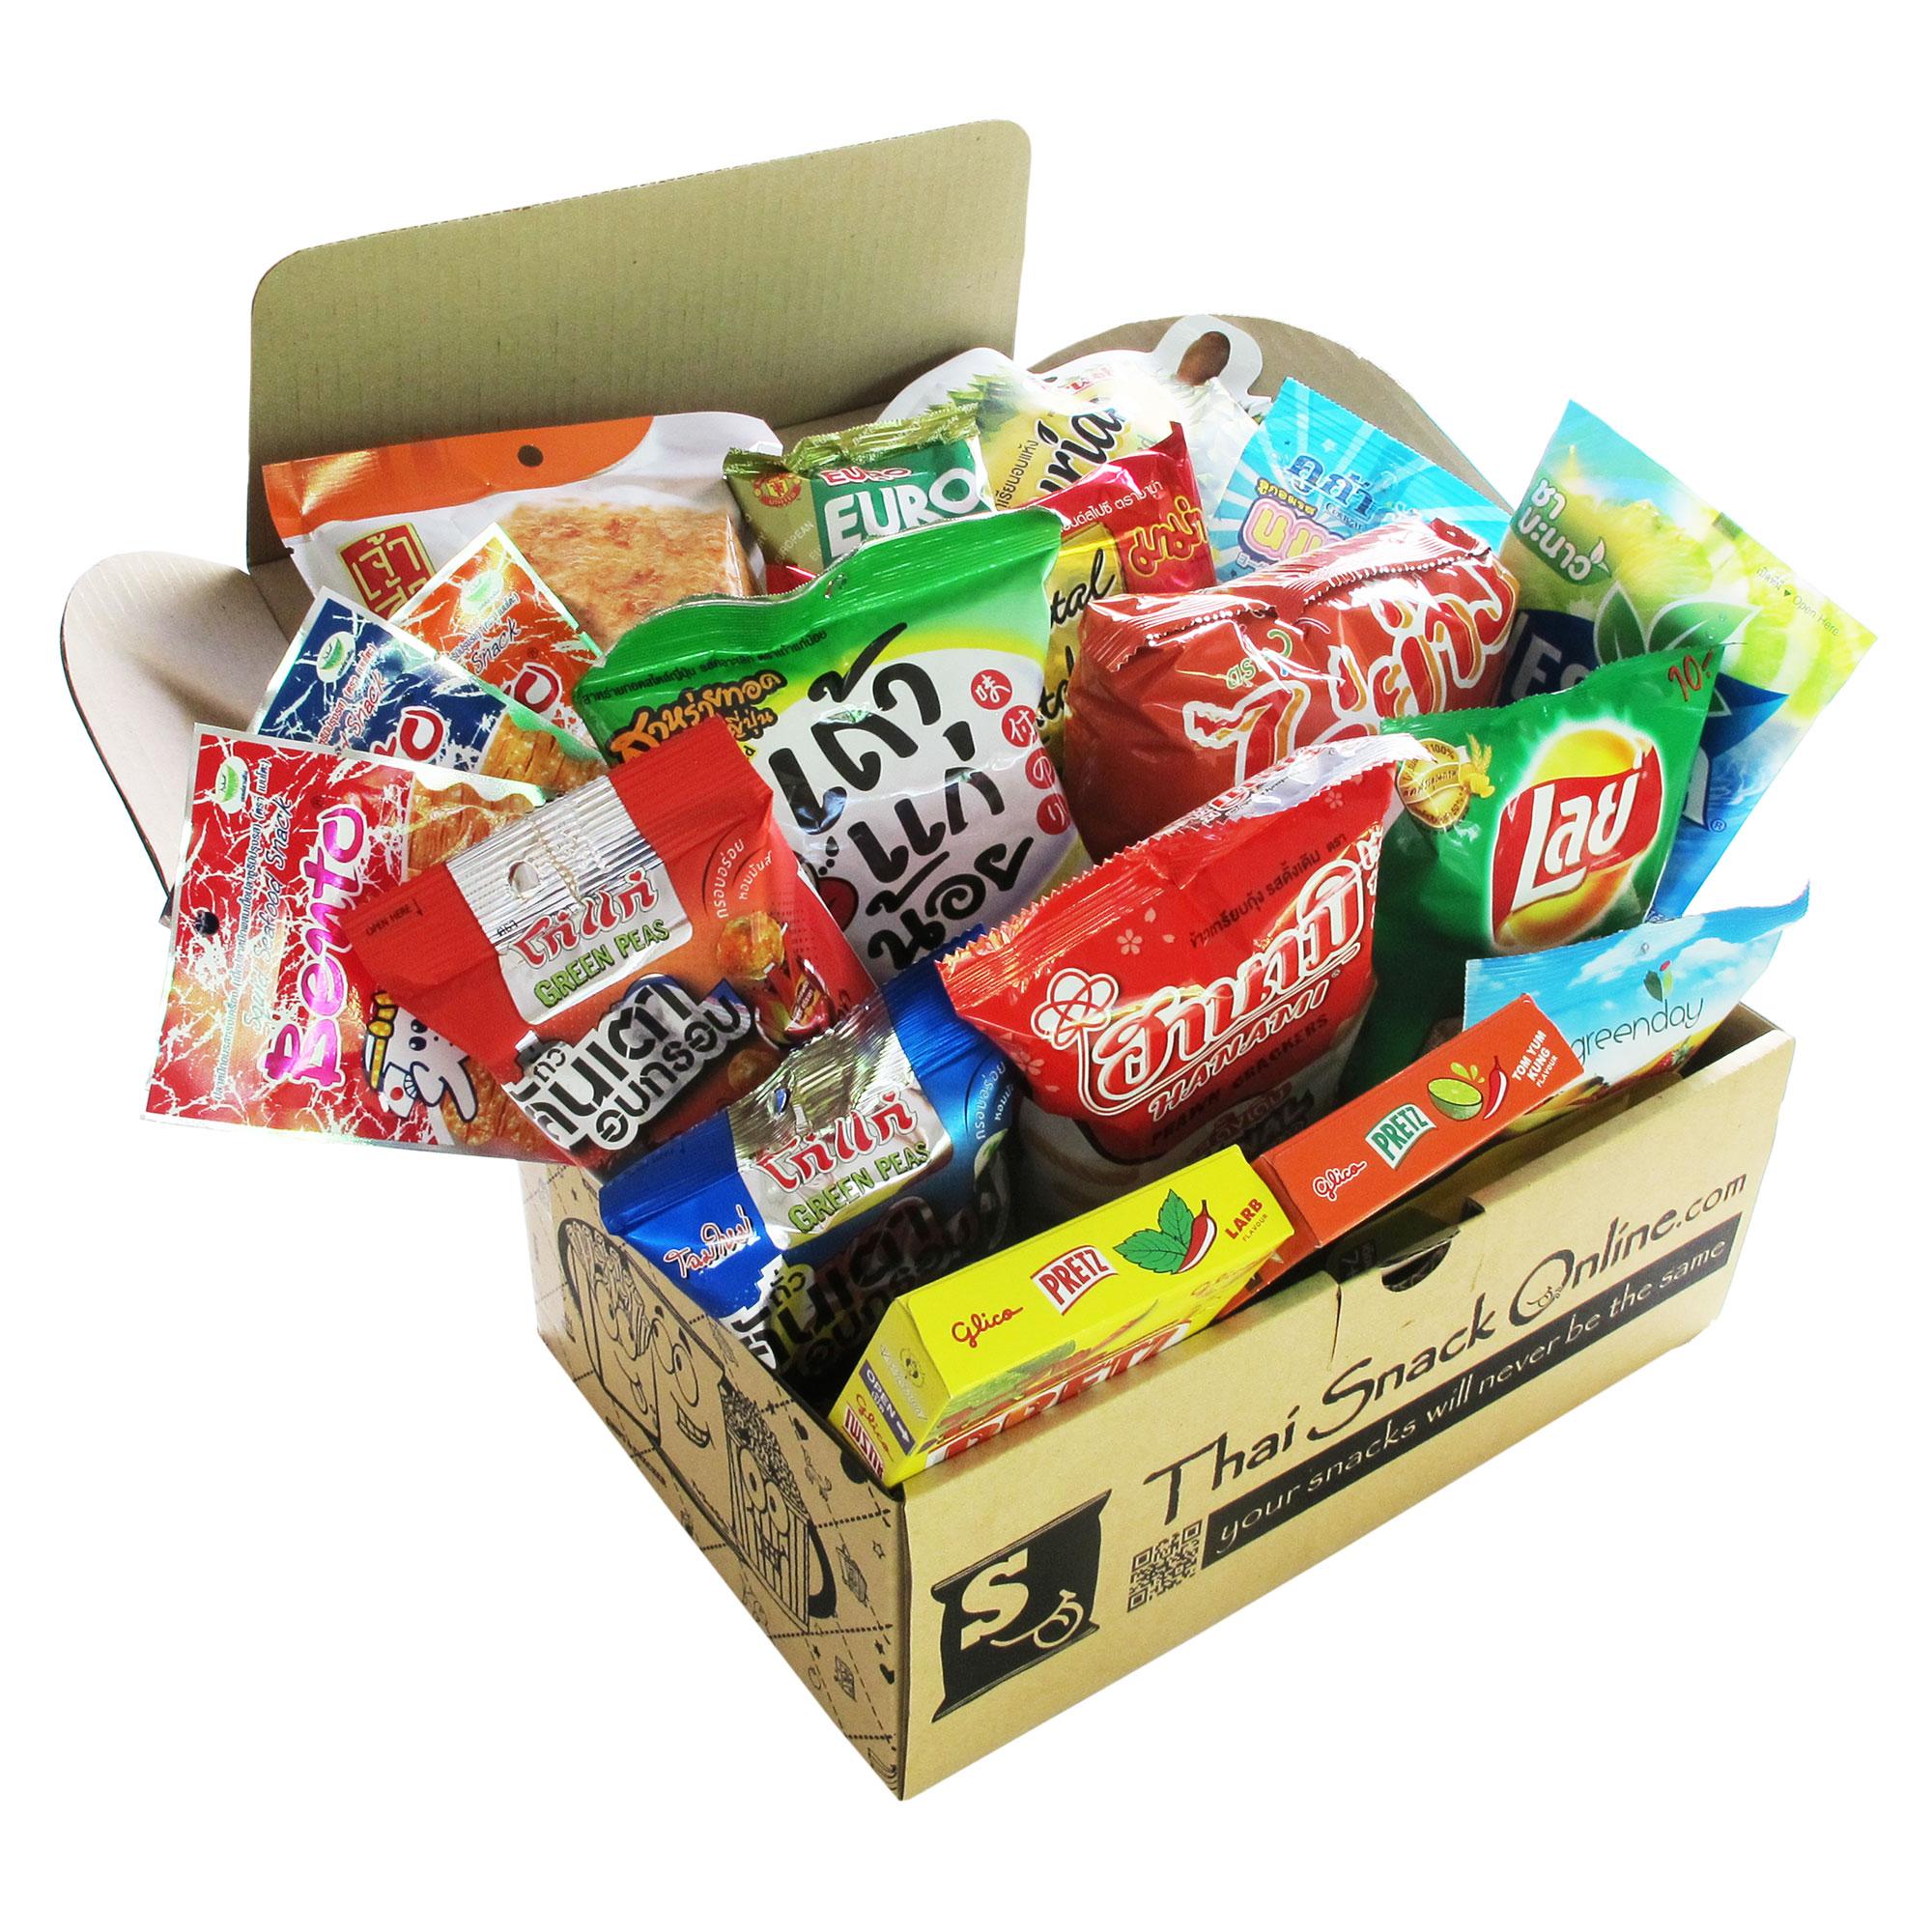 Thai Snack Online | Wholesale Benefits | Wholesaler